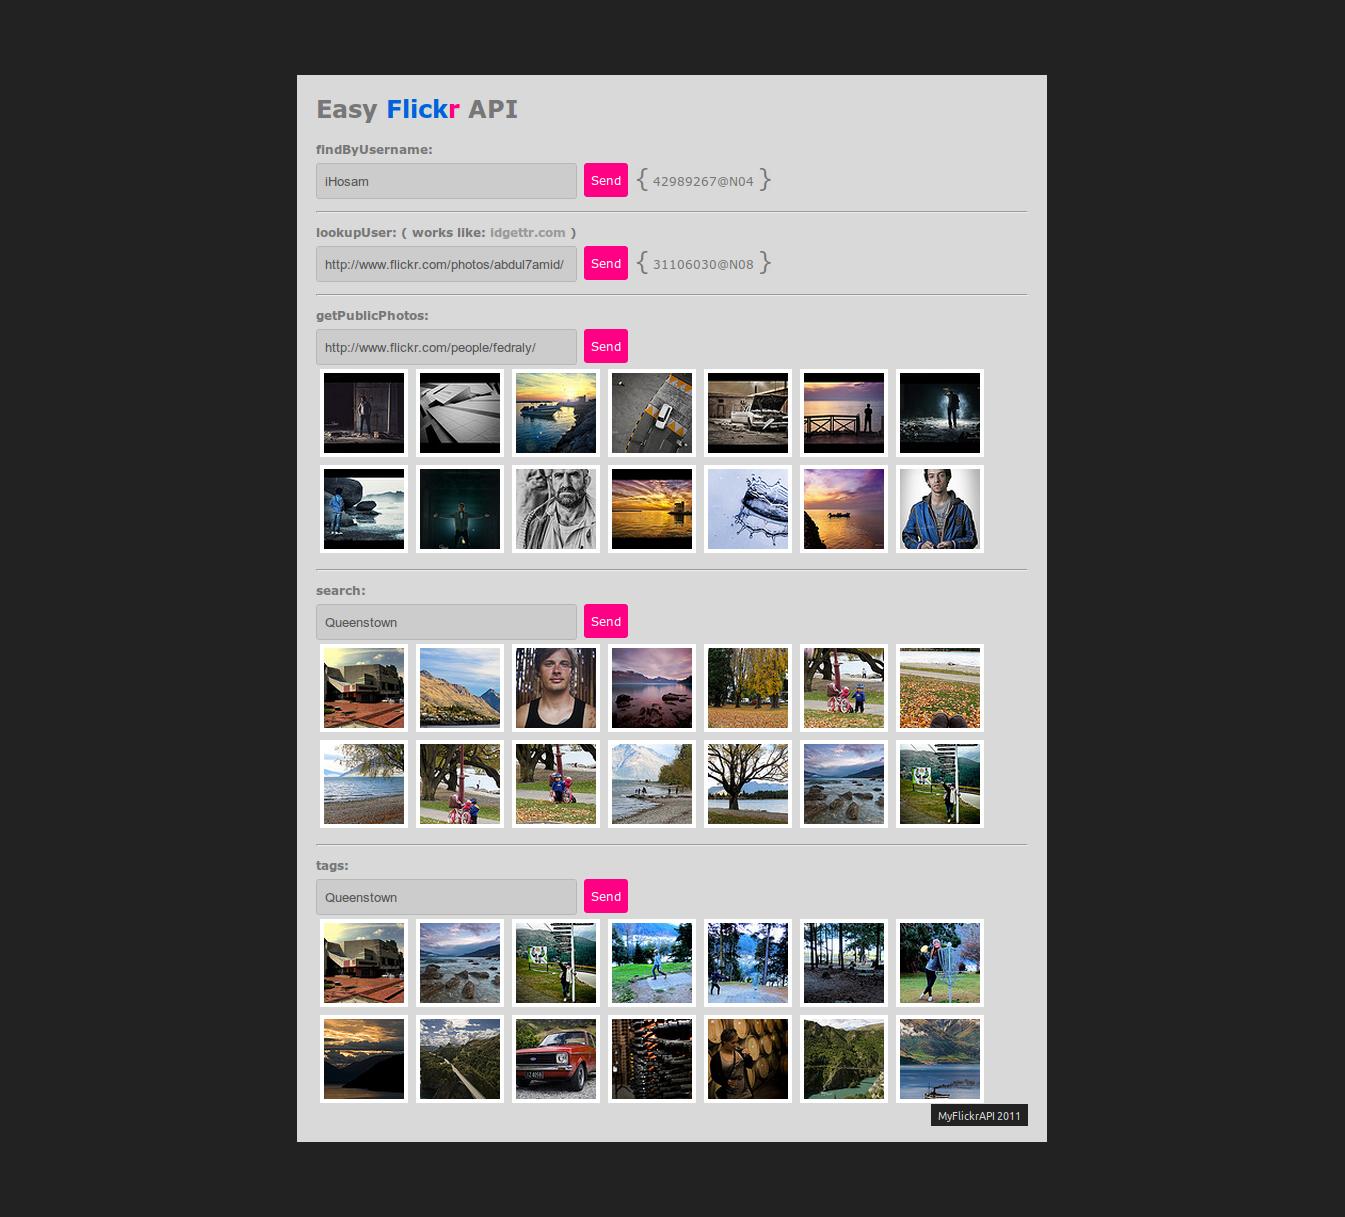 Easy Flickr API